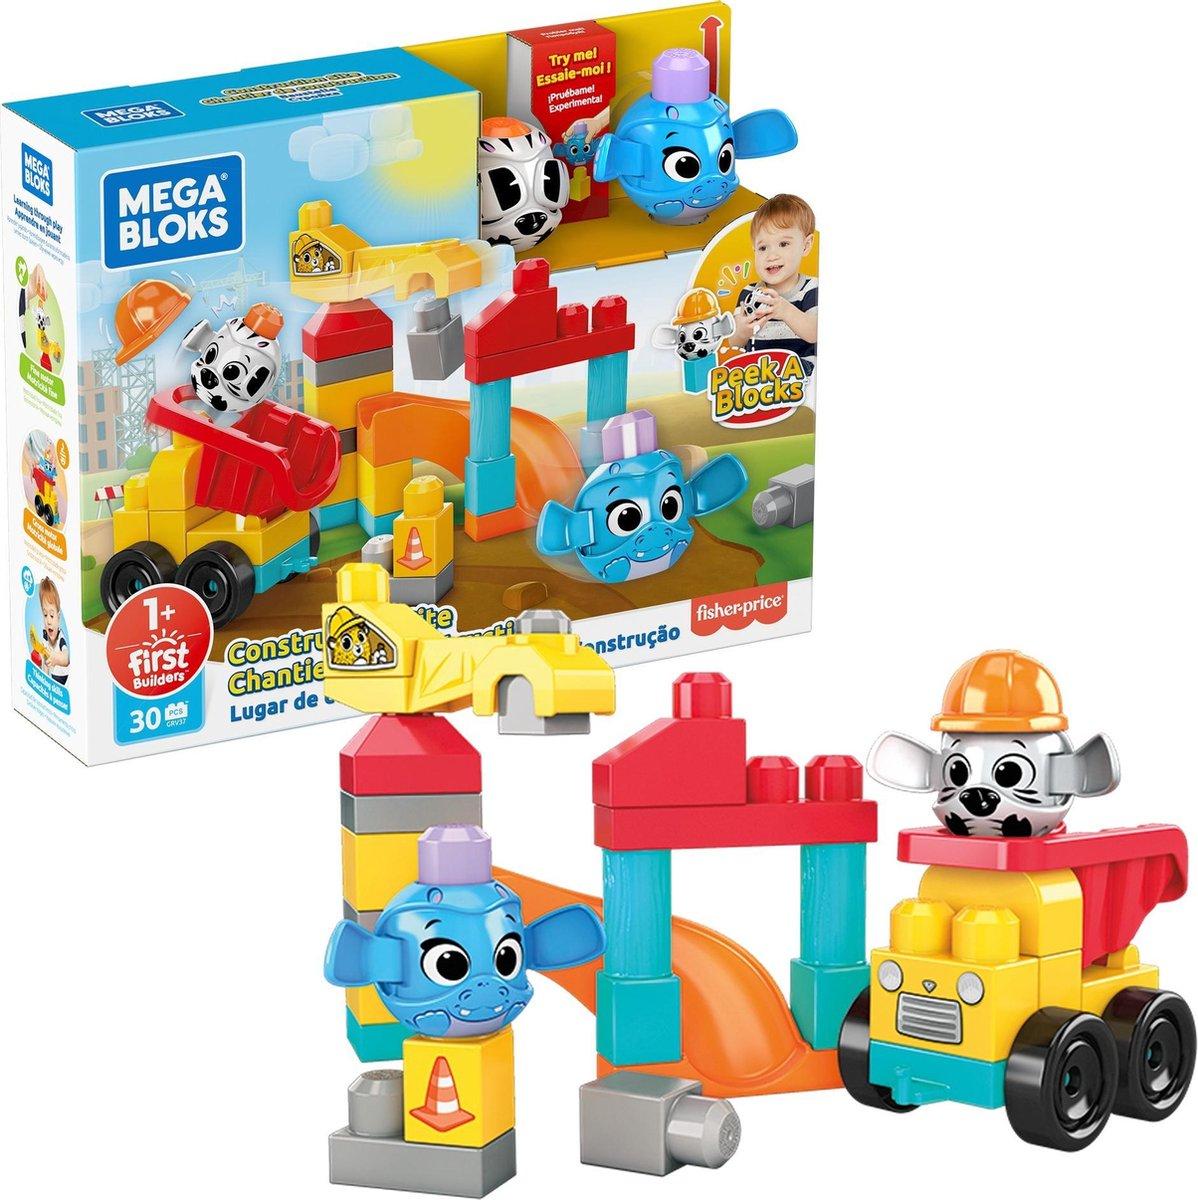 Fisher Price Mega Bloks - Peek a Blocks Constructie Site Bouwset